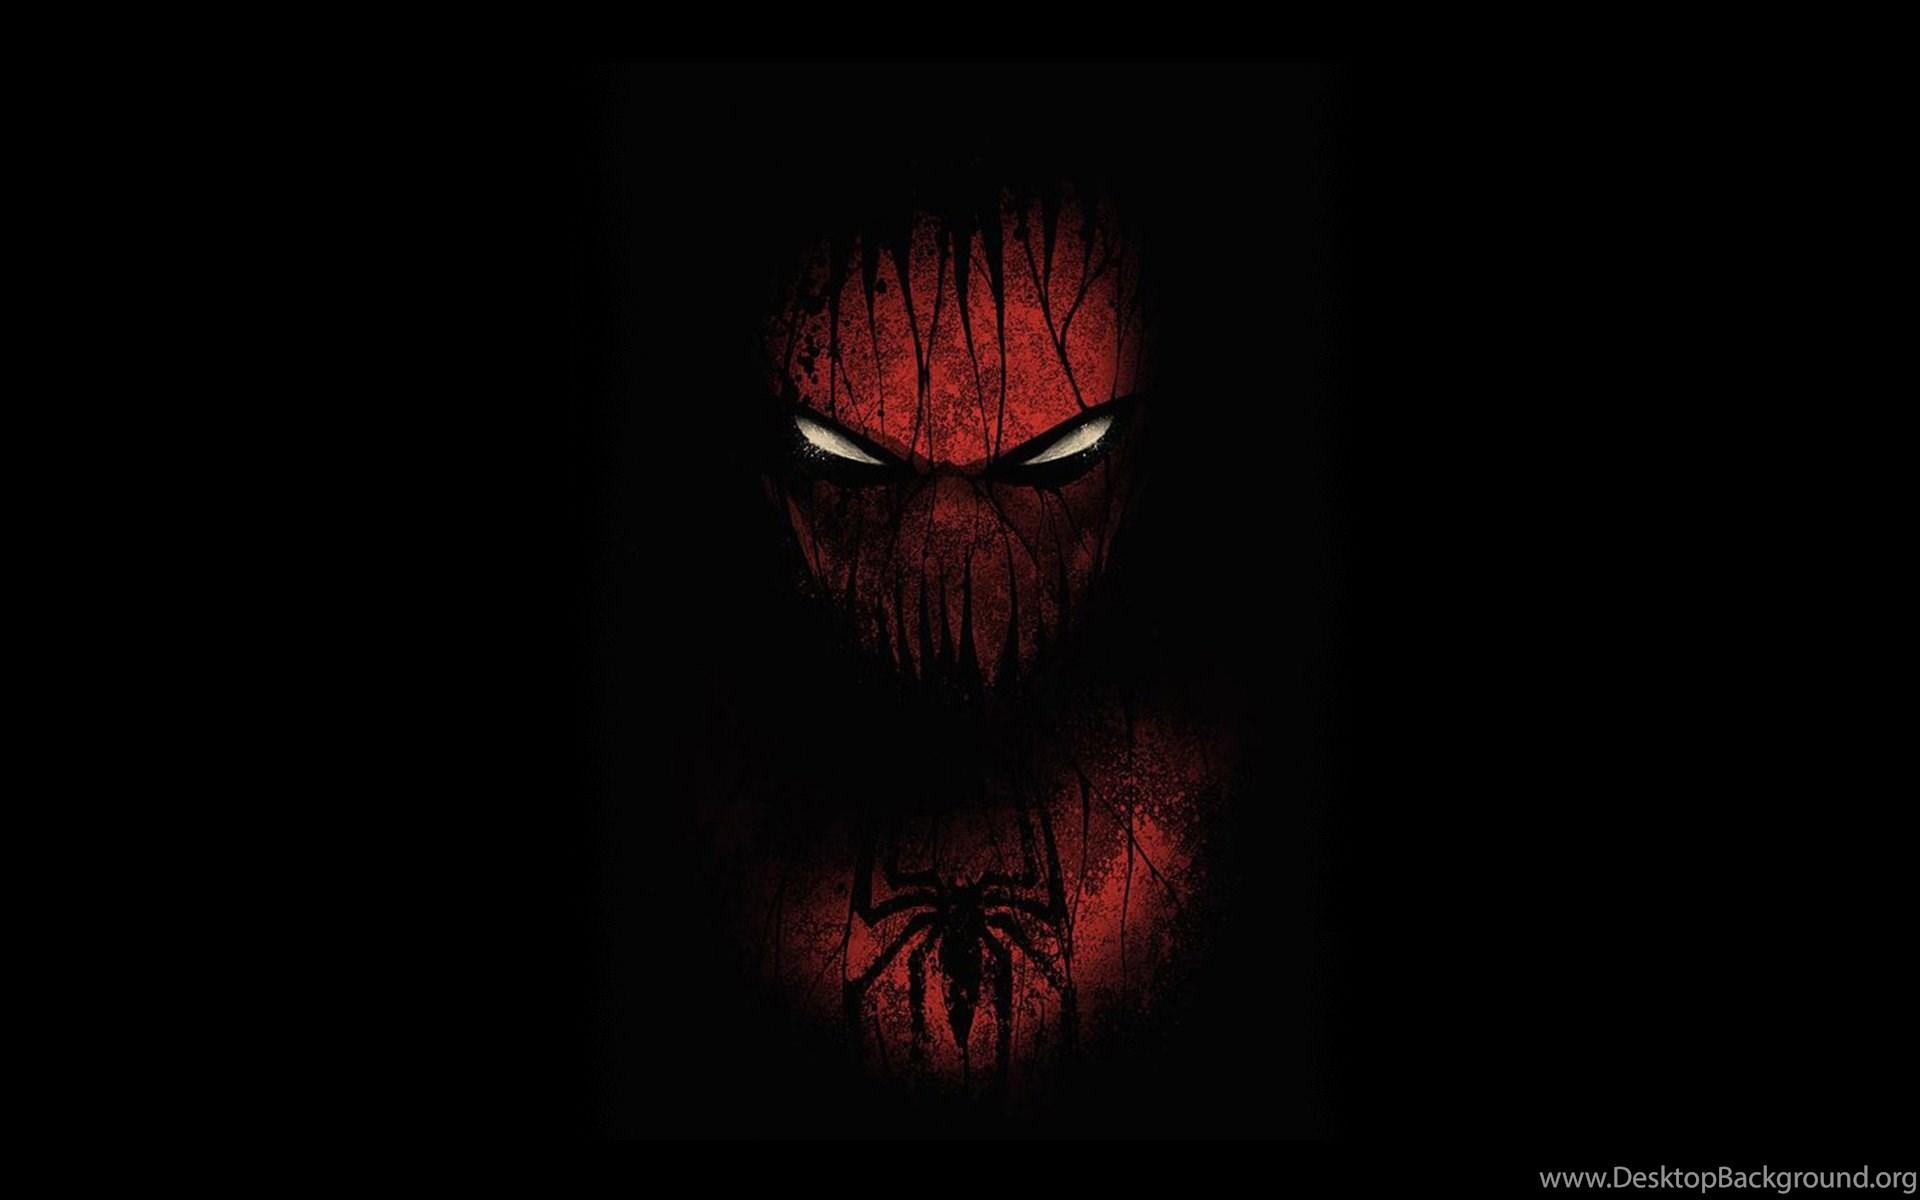 Download Spiderman Logo Wallpapers Hd Resolution Desktop Background